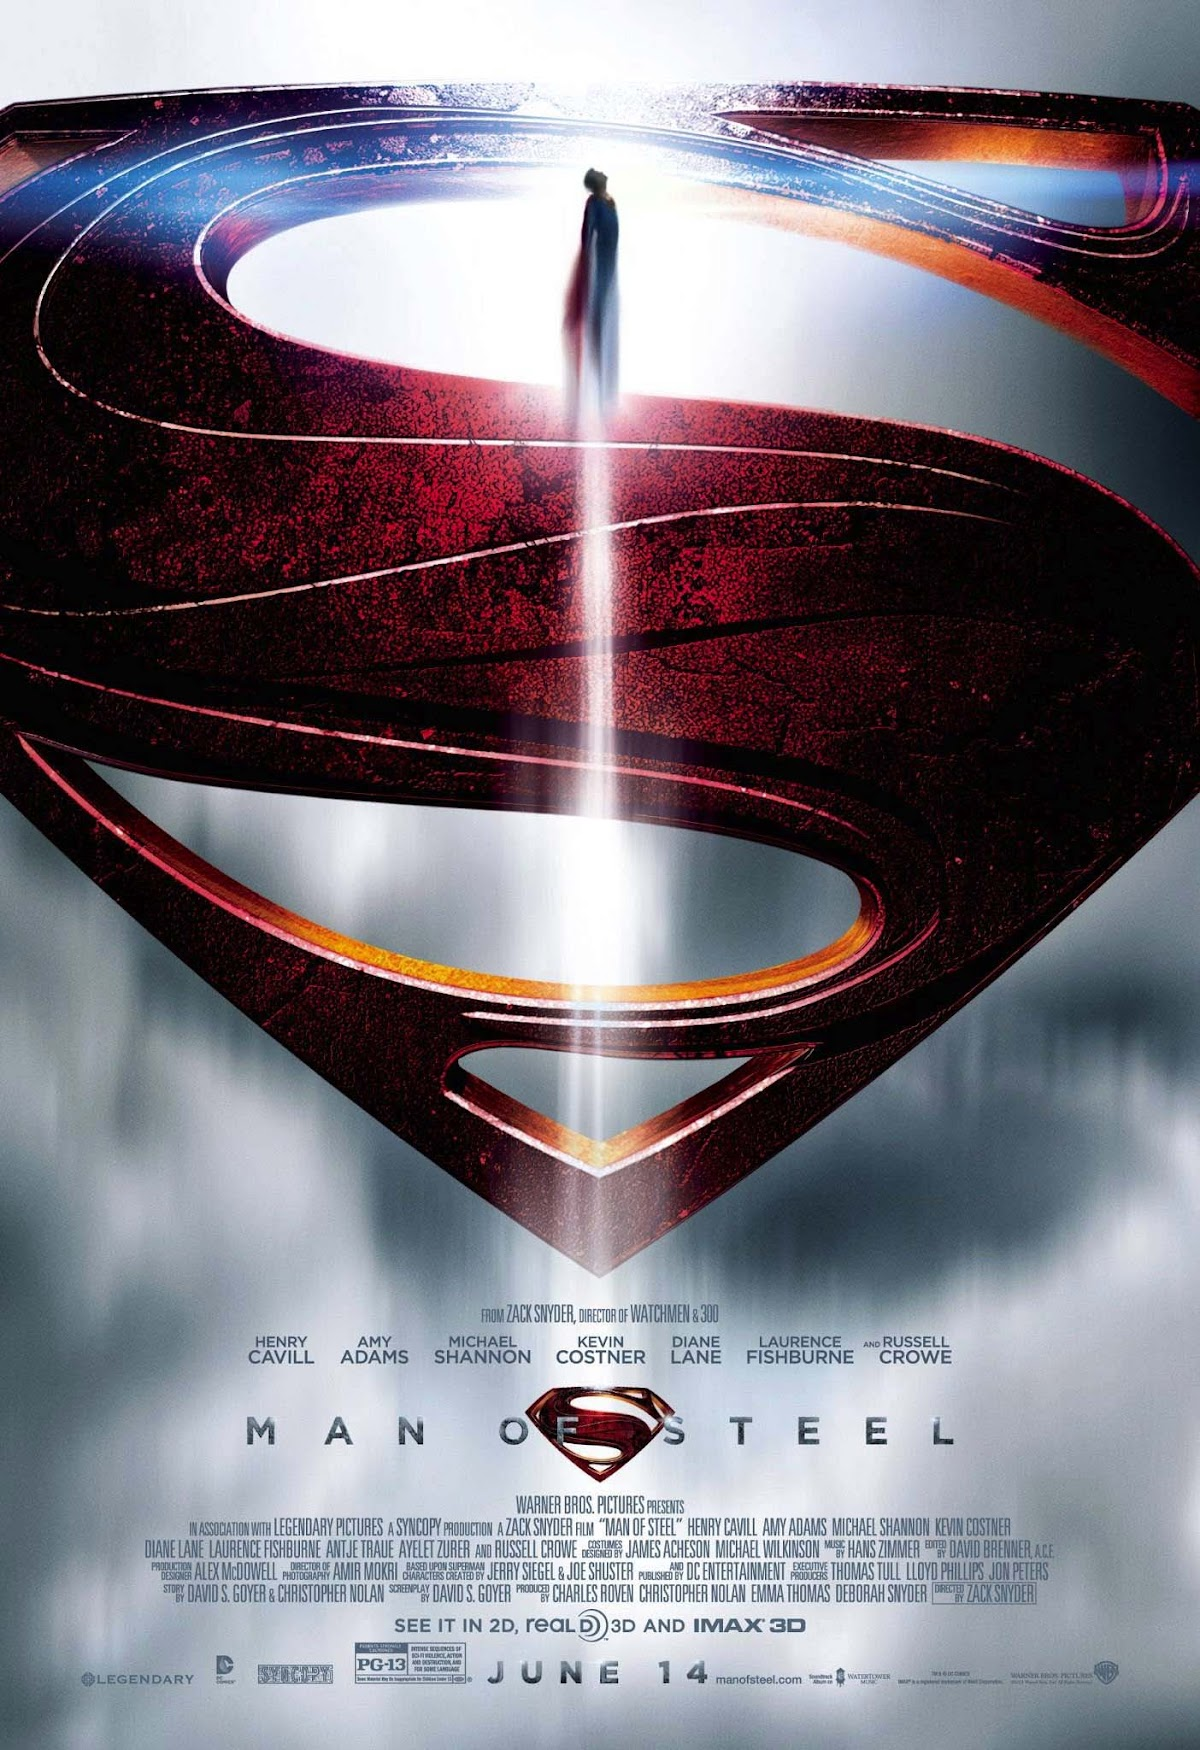 http://3.bp.blogspot.com/-UuZ34PTLJyY/UY2s5hE71bI/AAAAAAAAdtc/c1dv0bN2yvE/s1750/man-of-steel-official-poster4.jpg